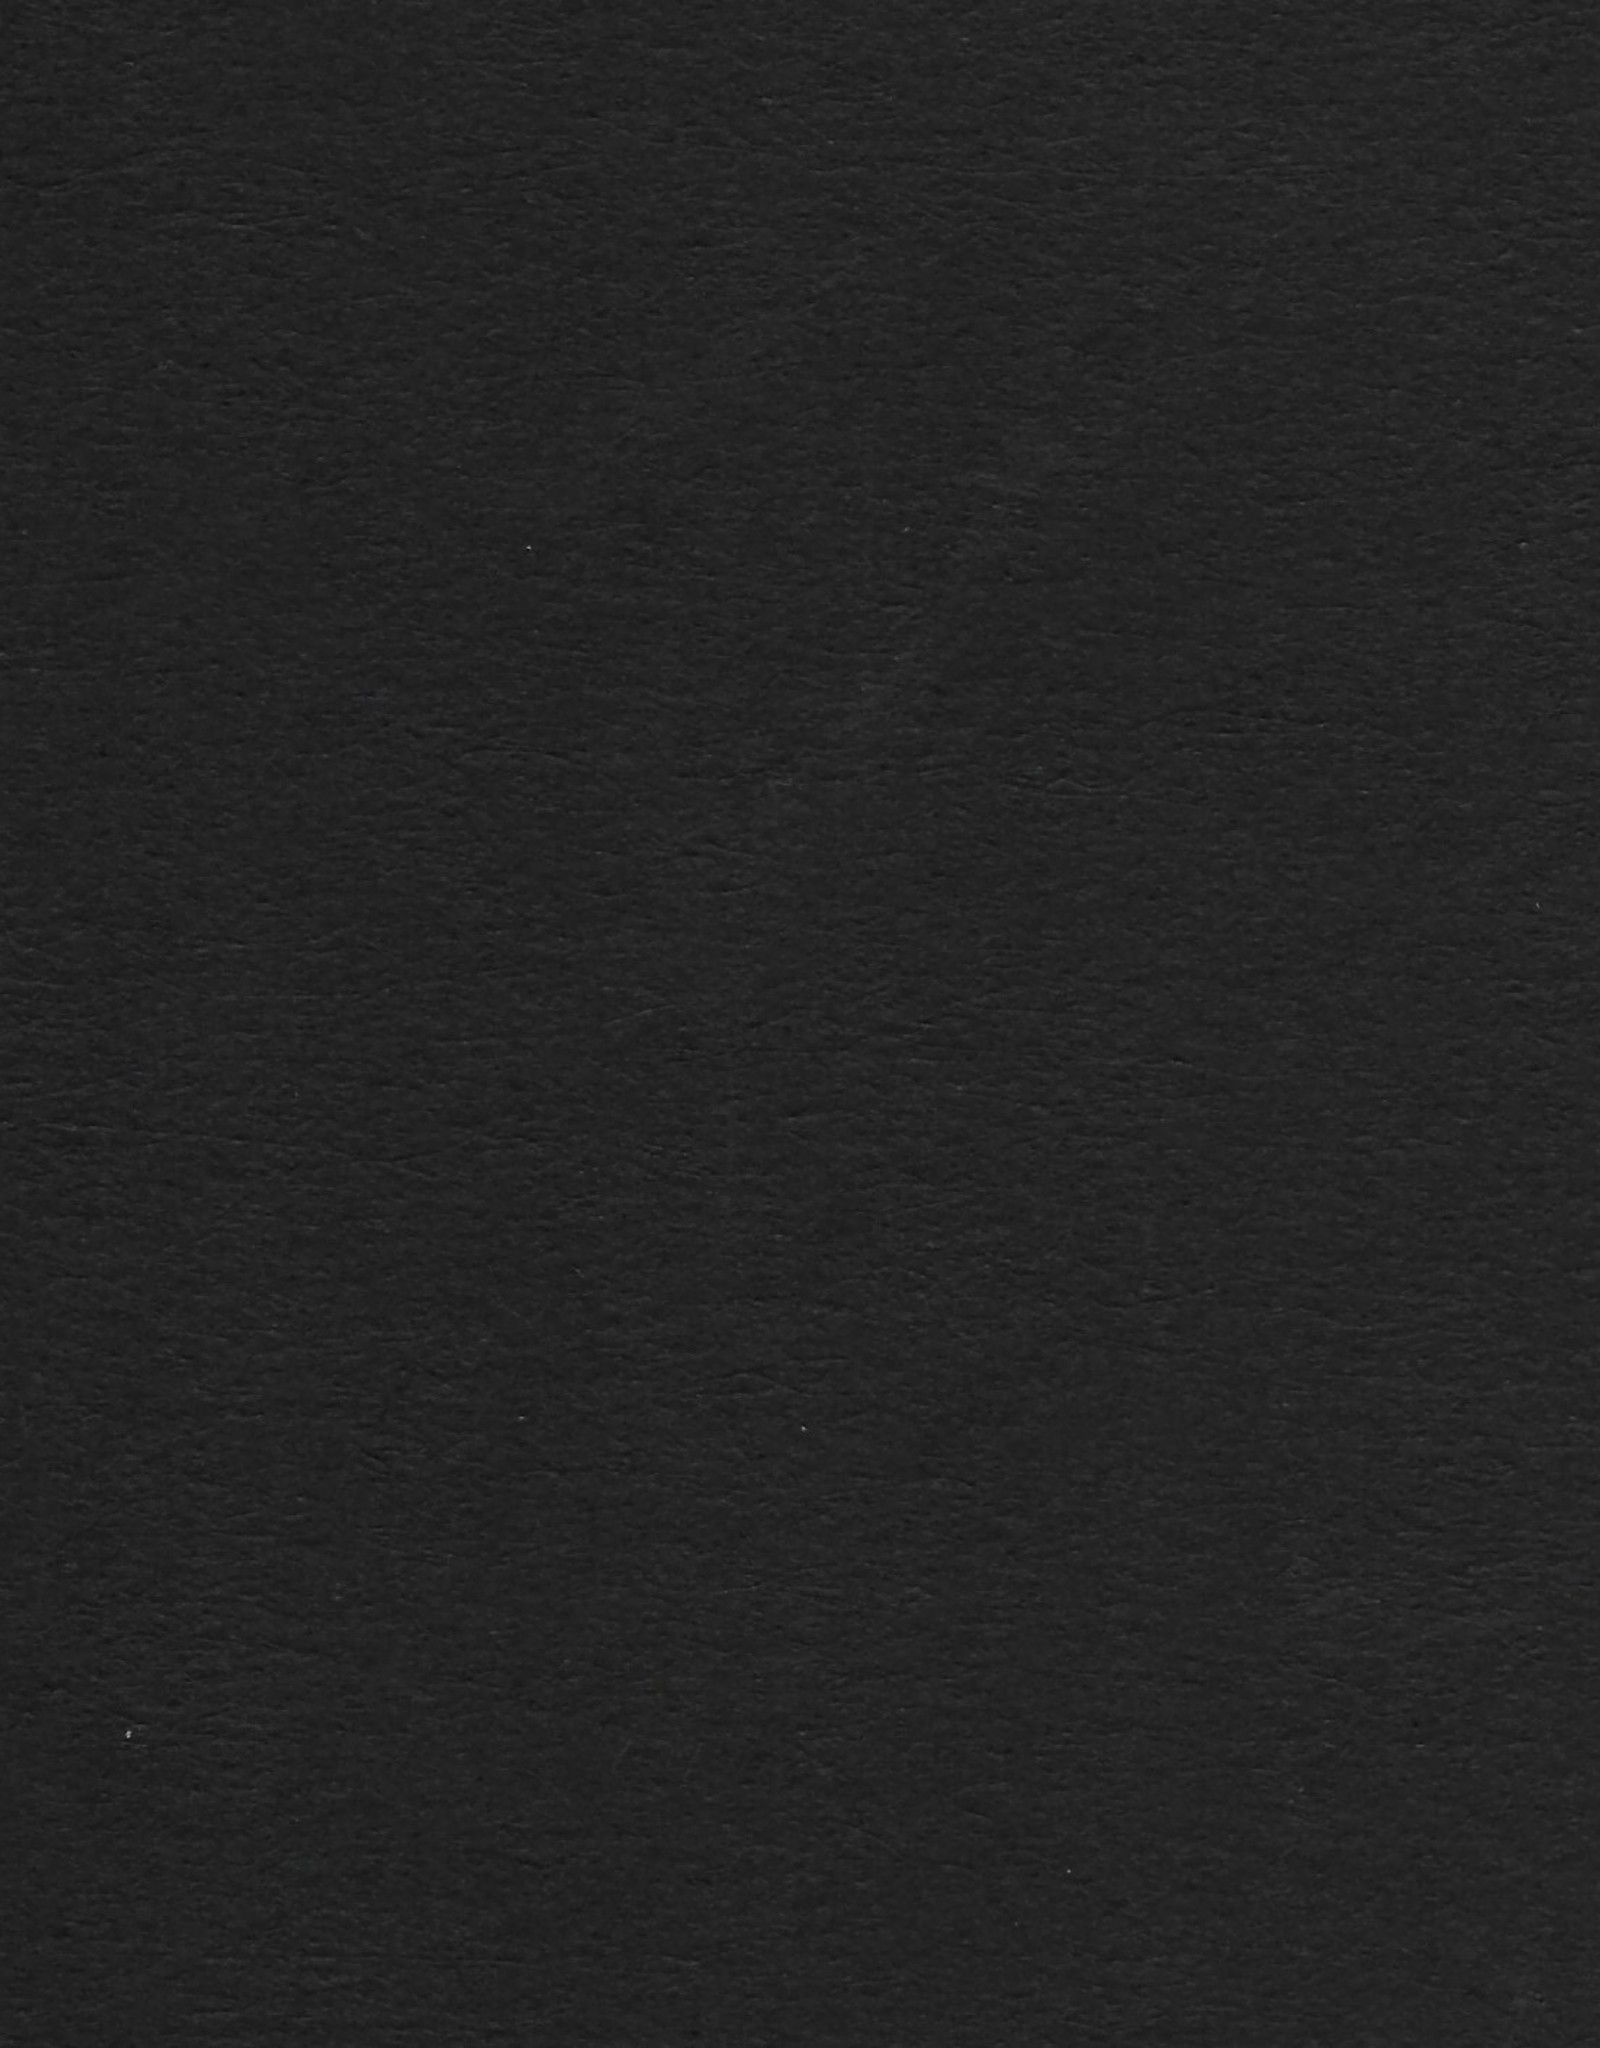 "Colorplan, 91#, Text, Ebony Black, 25"" x 38"", 135 gsm"